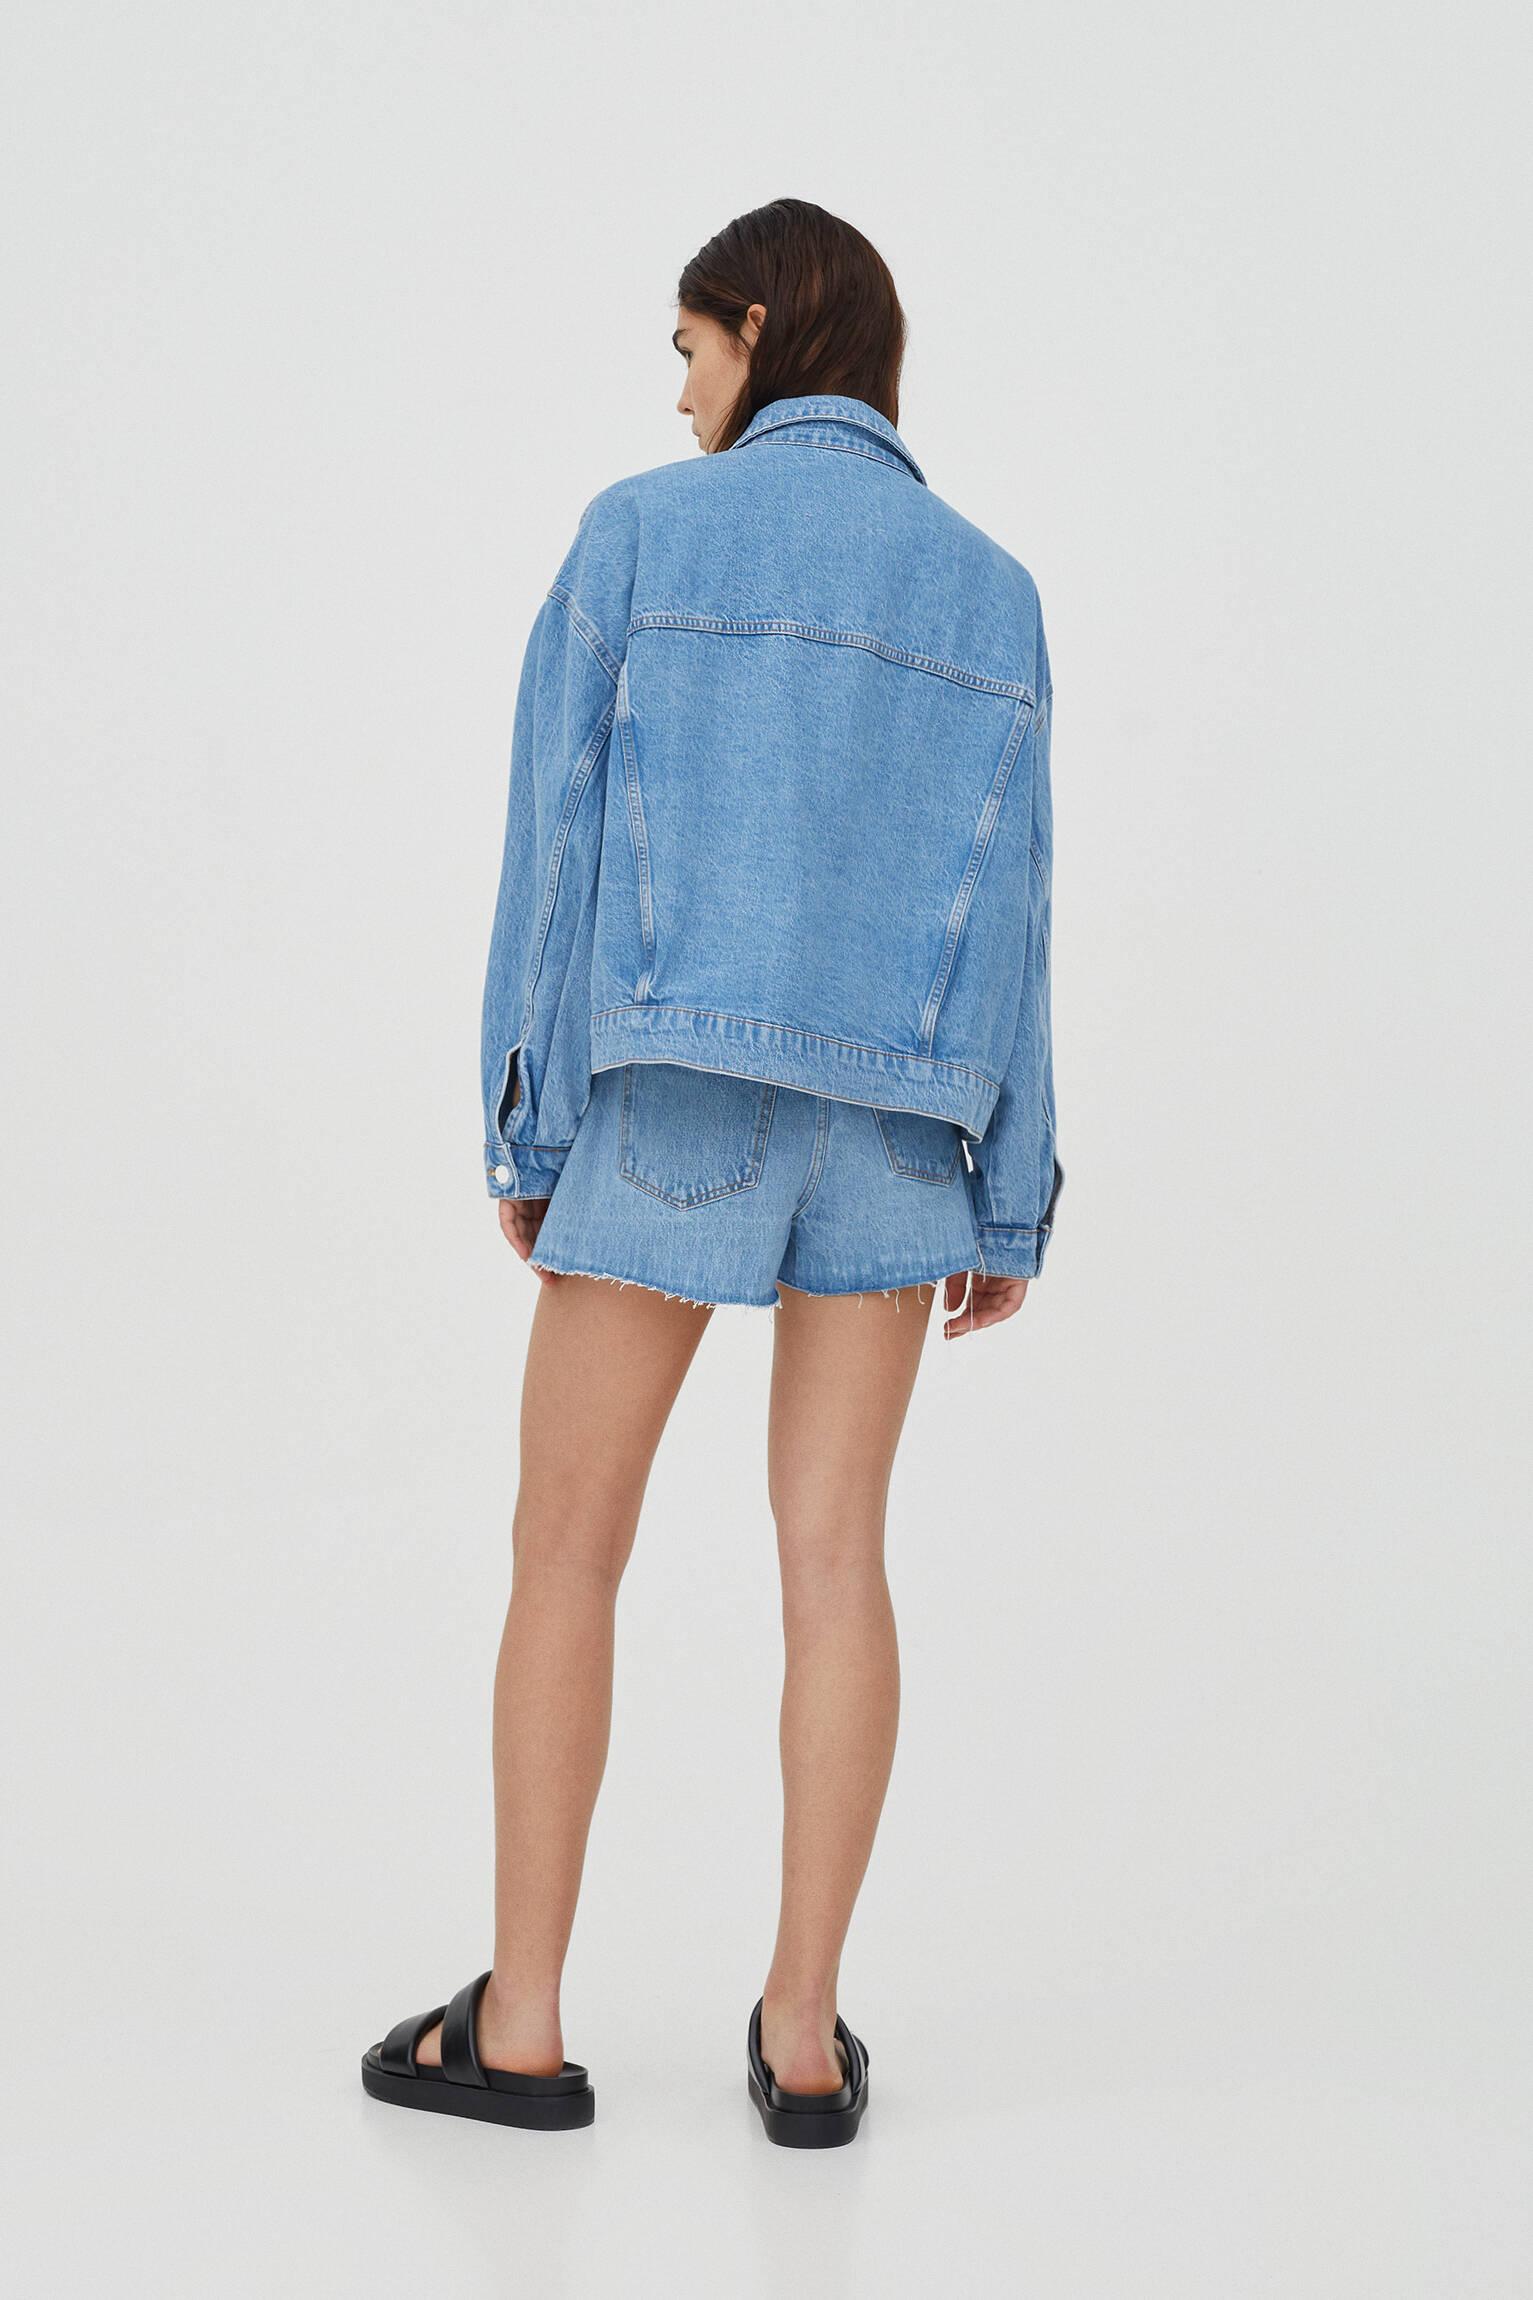 Синяя джинсовая куртка со складками СИНИЙ Pull & Bear